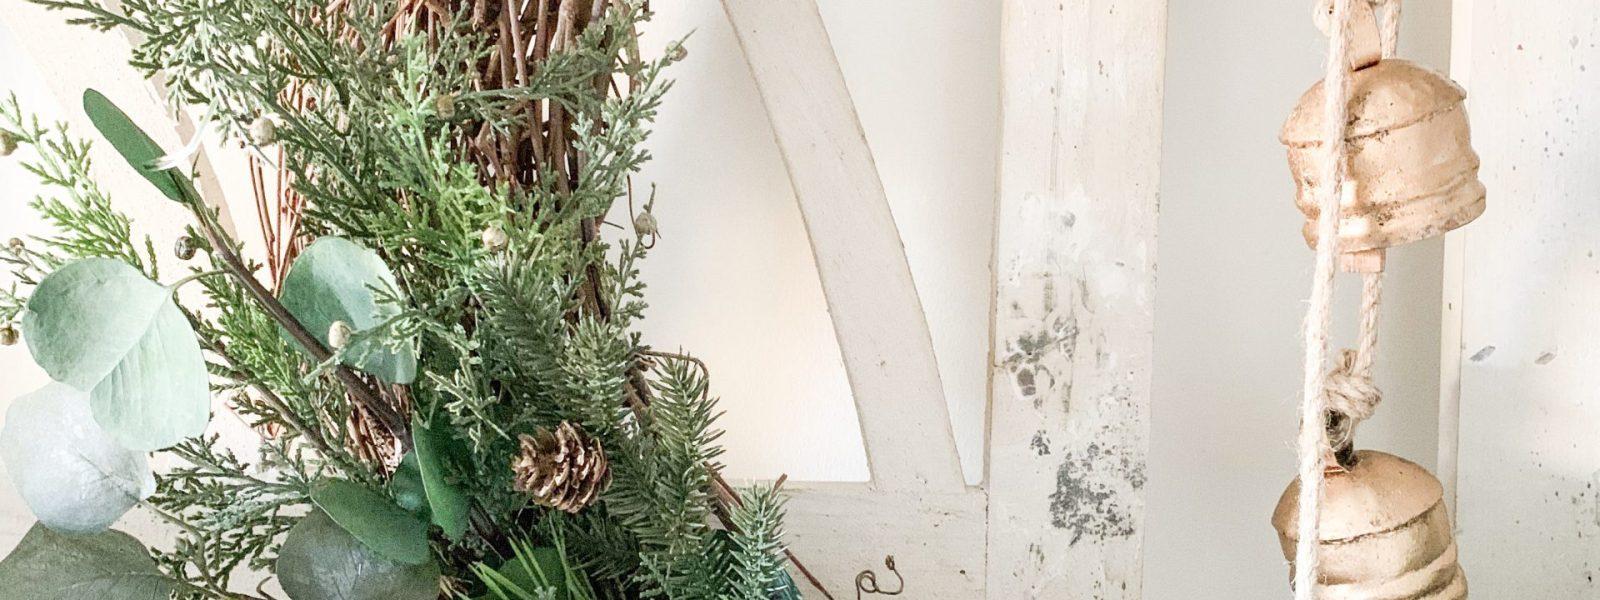 DIY Christmas Grapevine Wreath and Entryway Decor